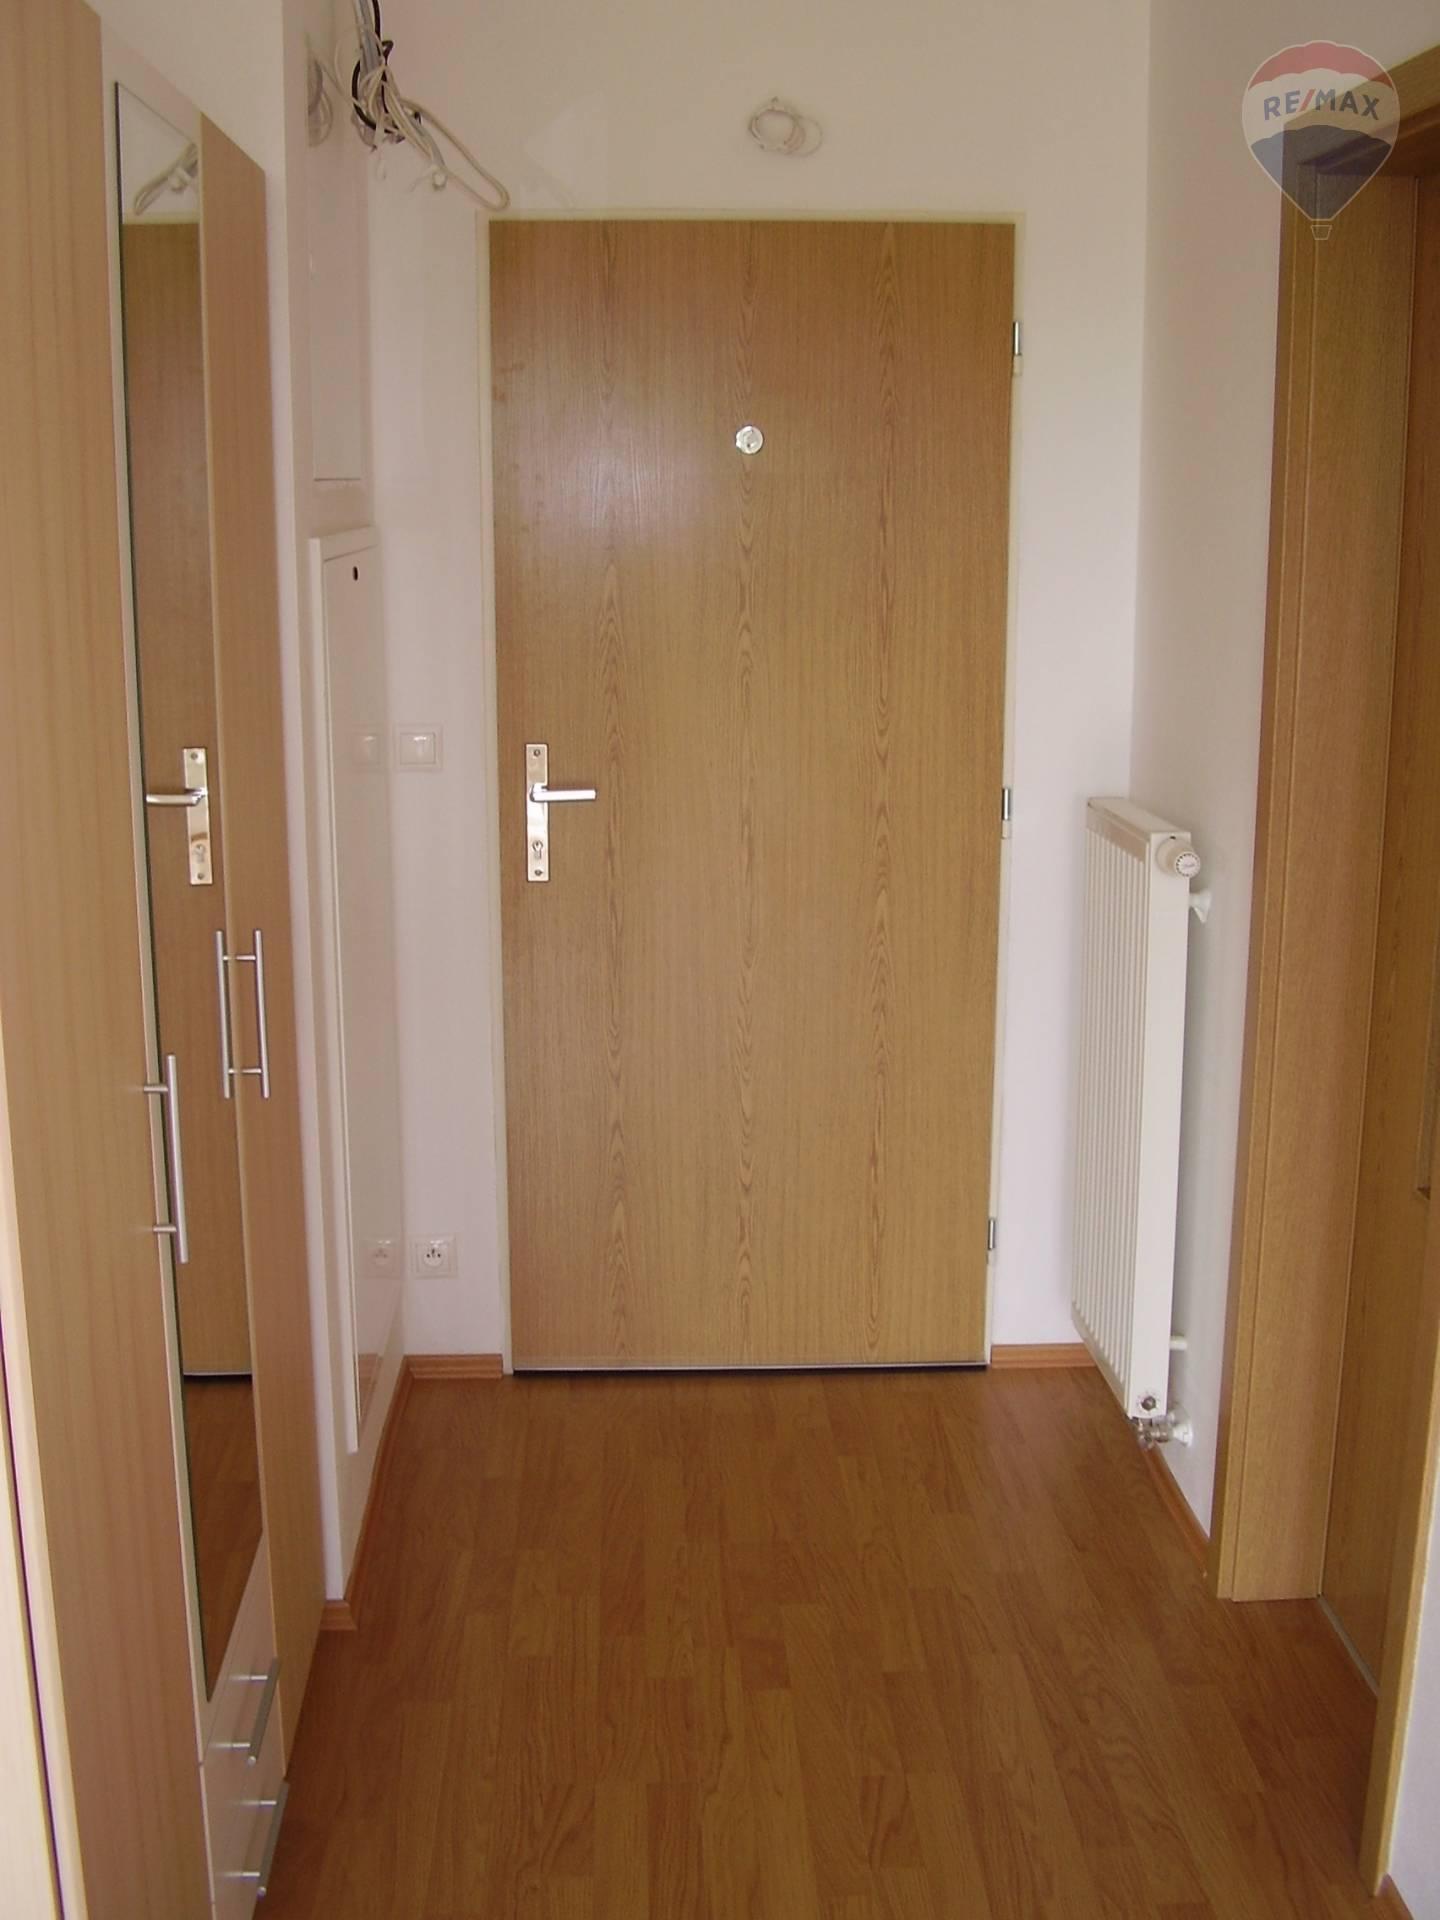 Predaj bytu (2 izbový) 58 m2, Bratislava - Devínska Nová Ves - Na prdaj 2 izbový byt v Bratislave, Devínka Nová Ves